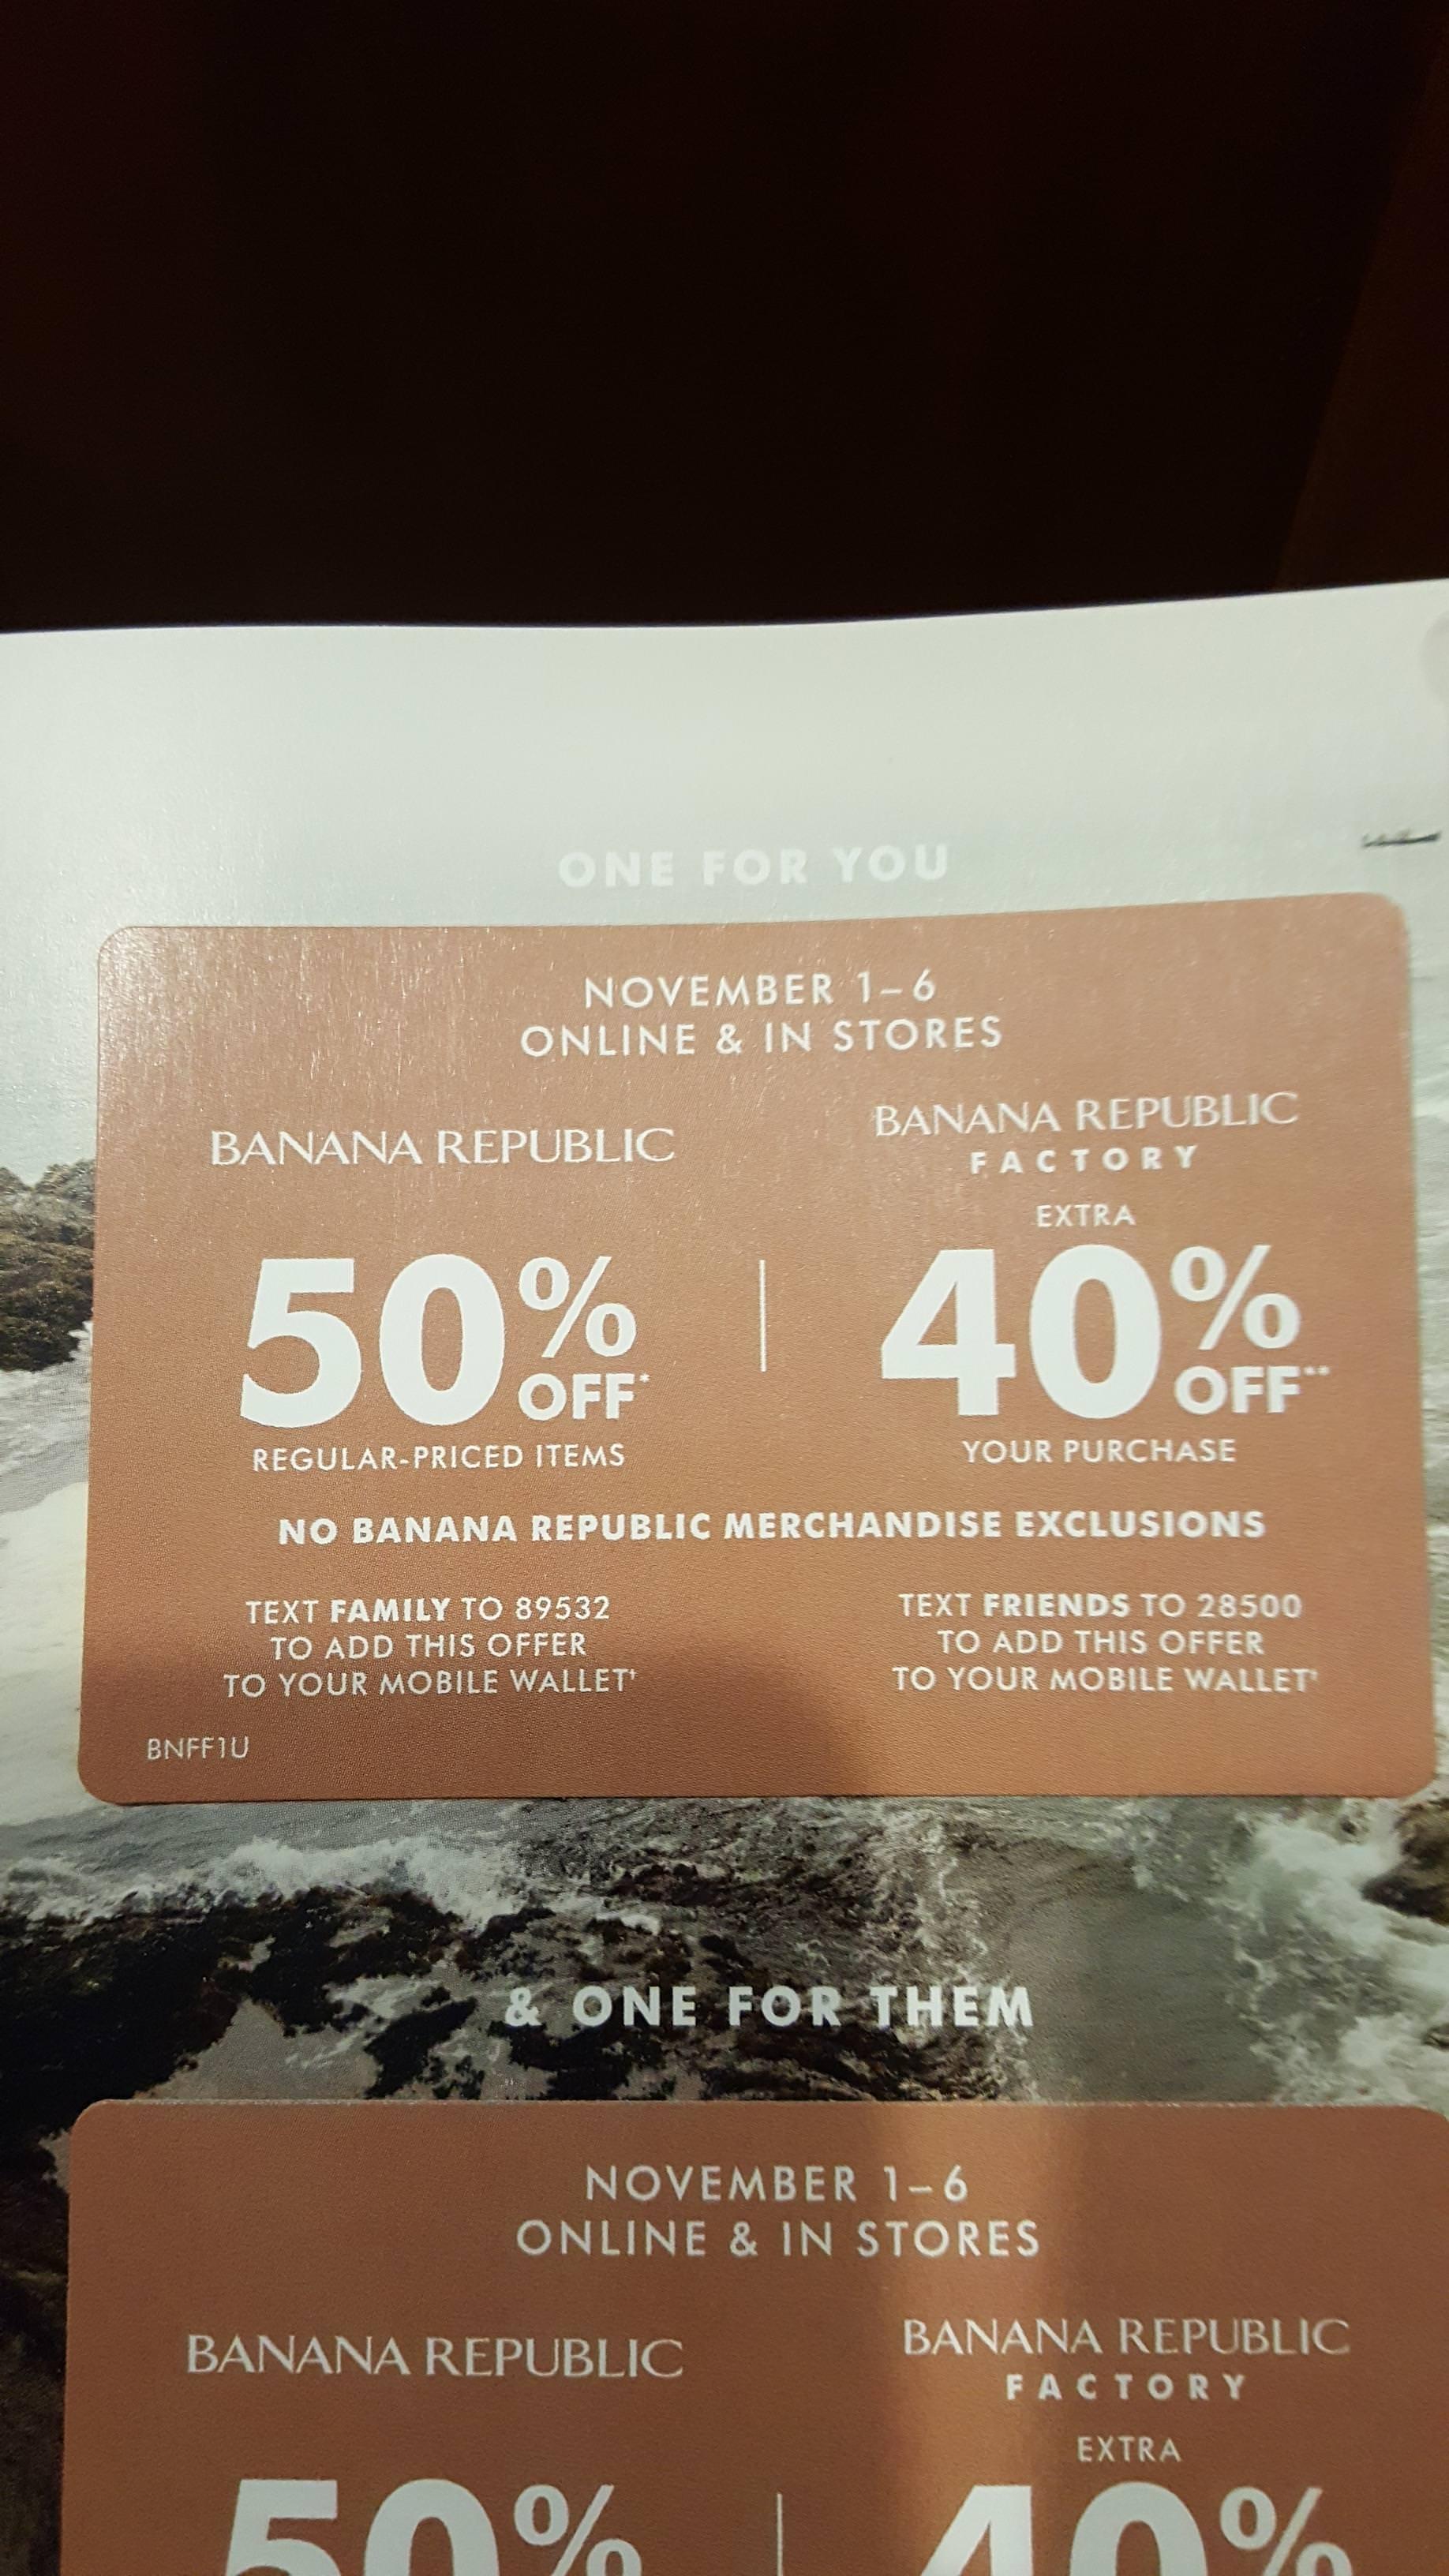 Banana Republic 50% off, BR Outlet 40% off, (no BR item exclusions) Nov. 1 to Nov. 6